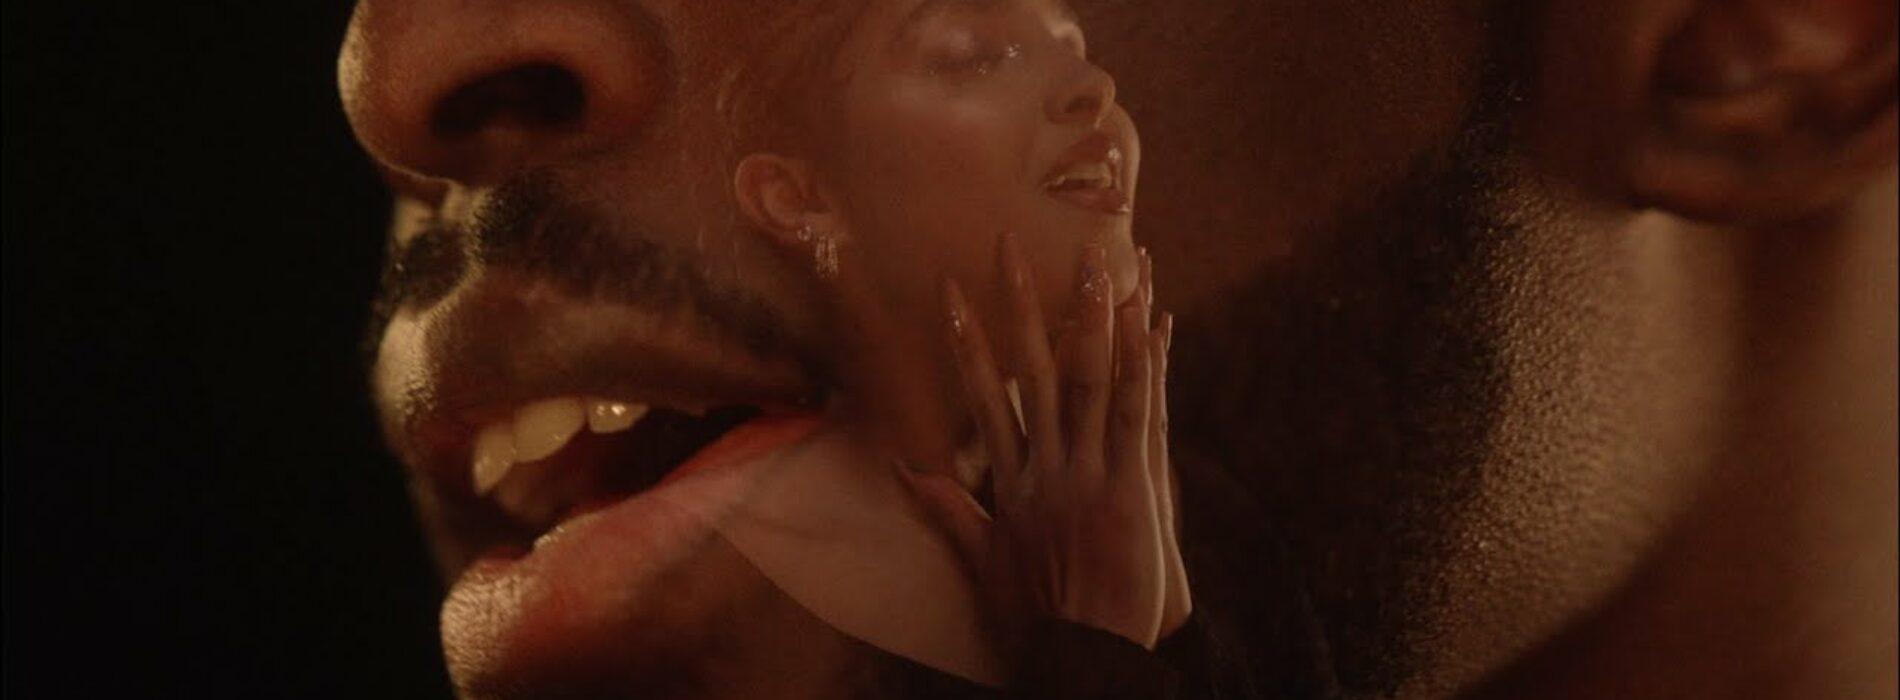 DADJU – Tout ou rien ft. Ocevne (Clip Officiel) – Mars 2021